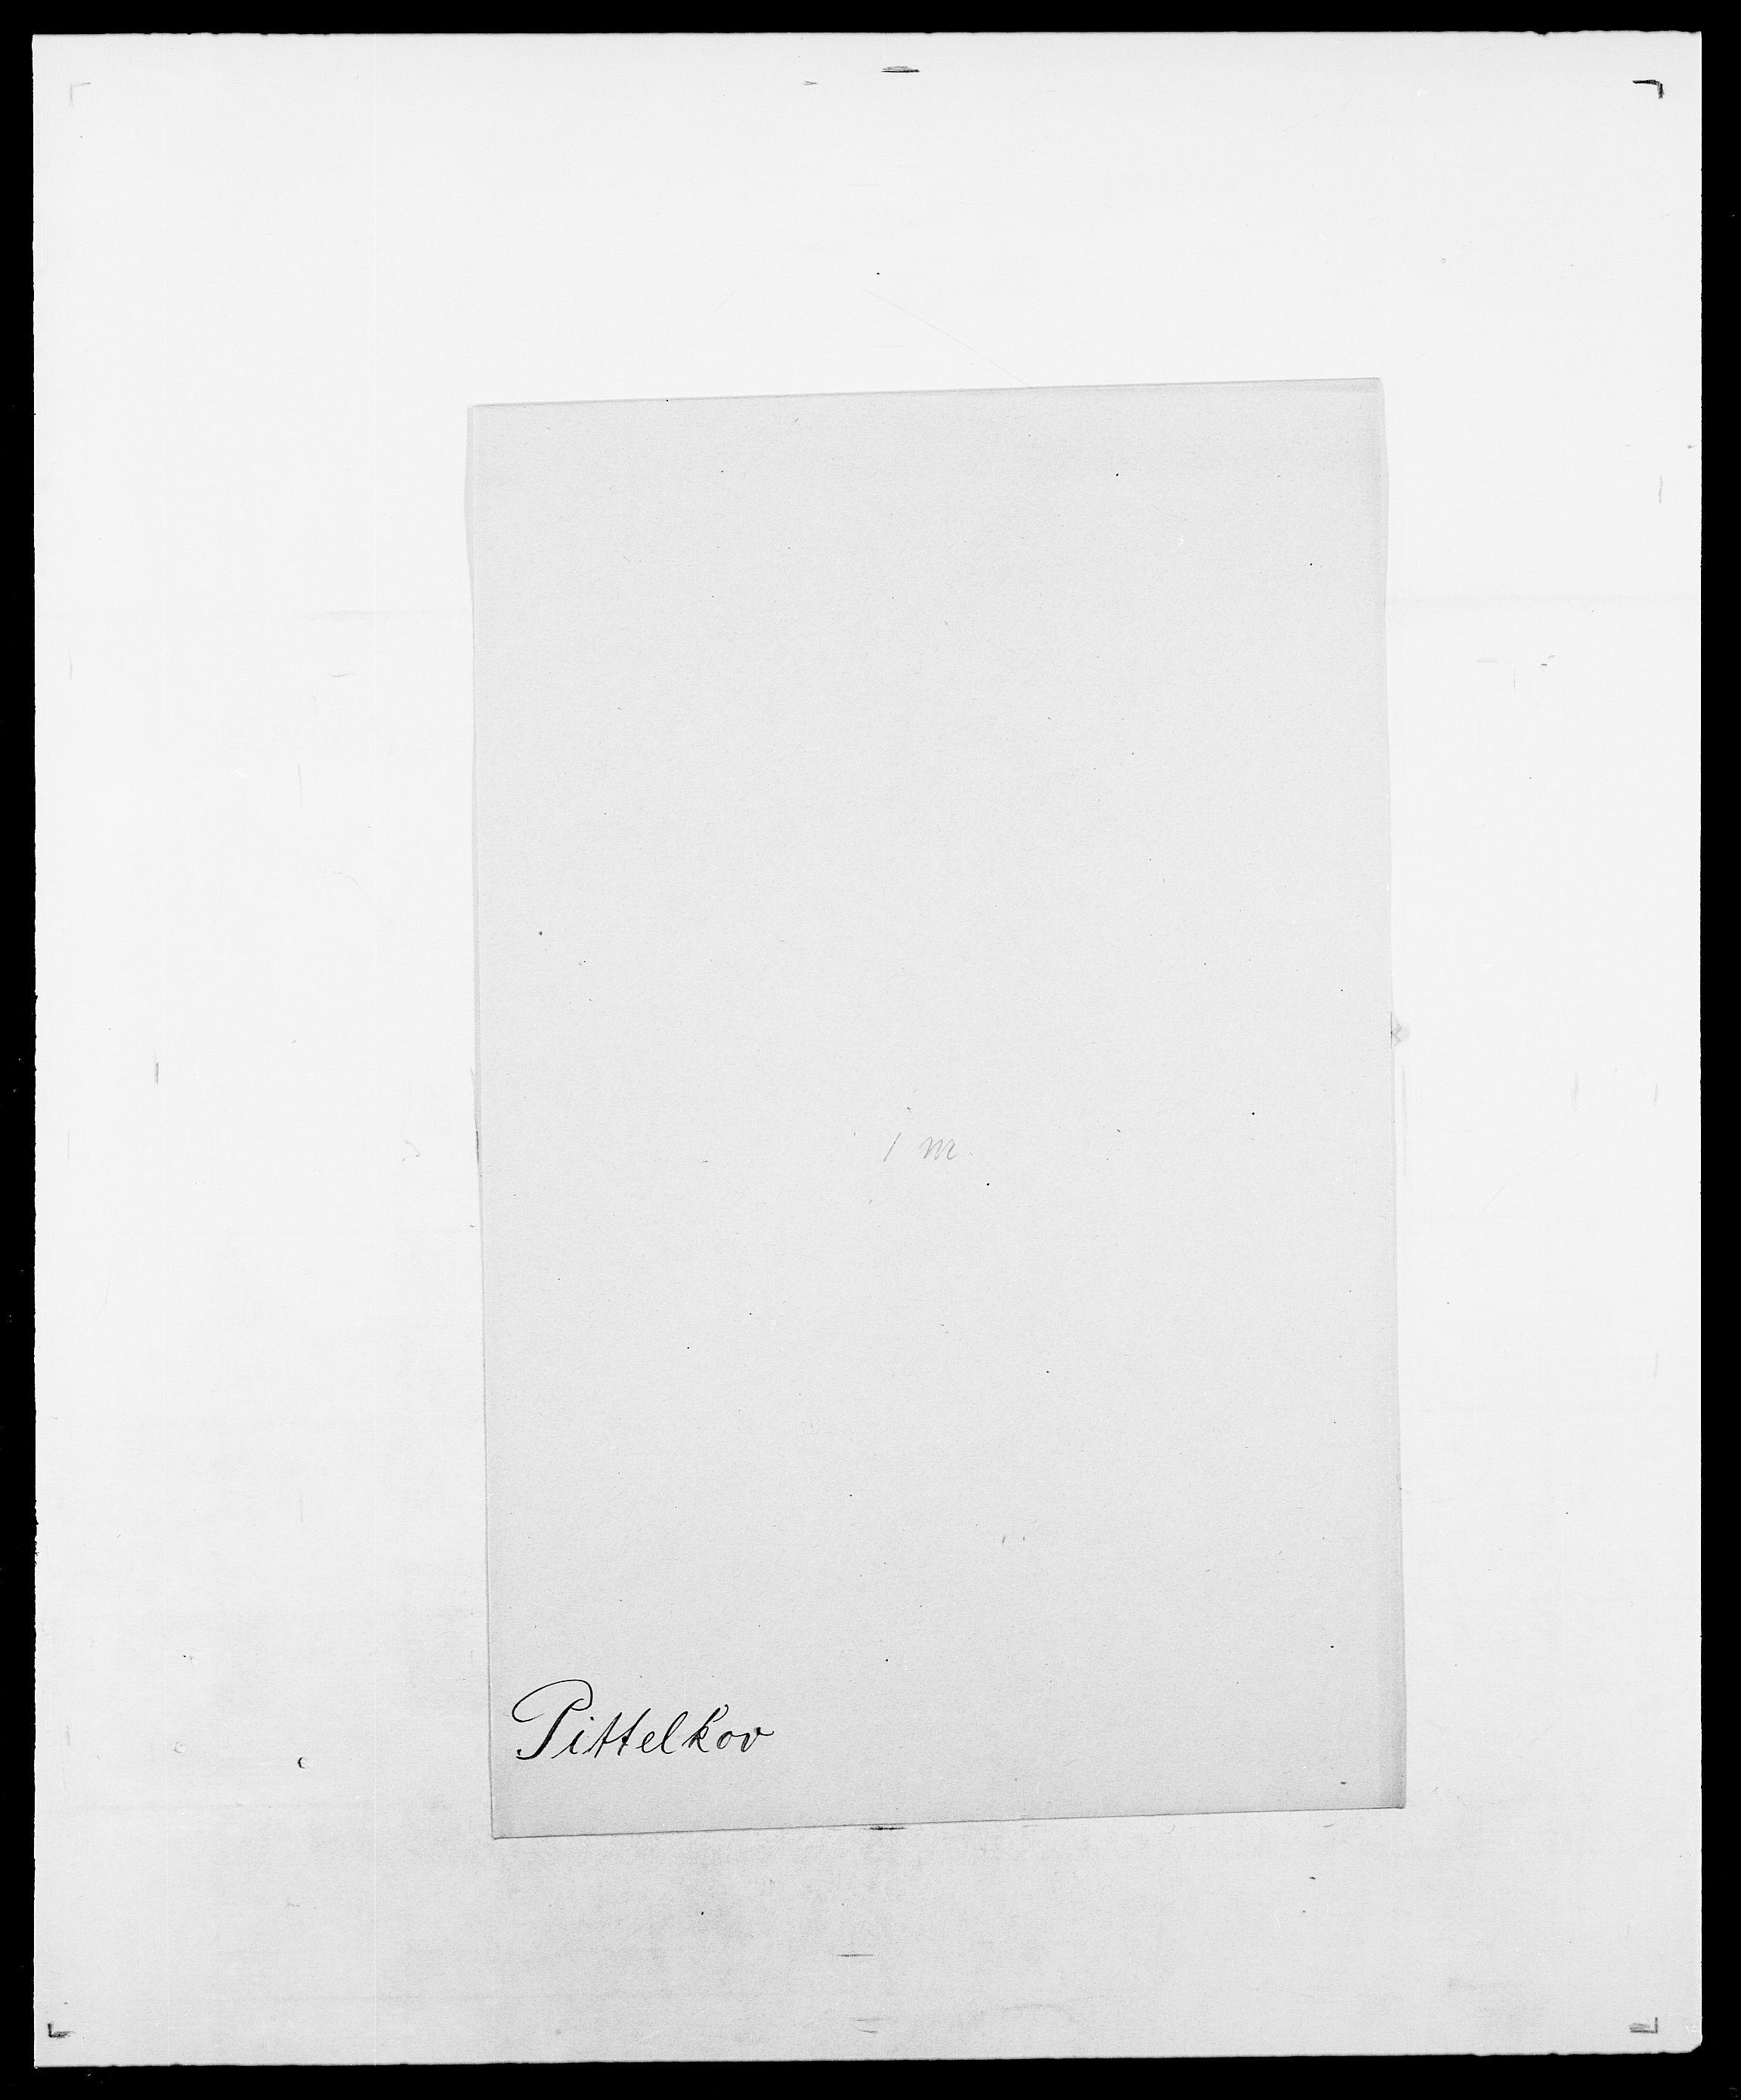 SAO, Delgobe, Charles Antoine - samling, D/Da/L0030: Paars - Pittelkov, s. 573